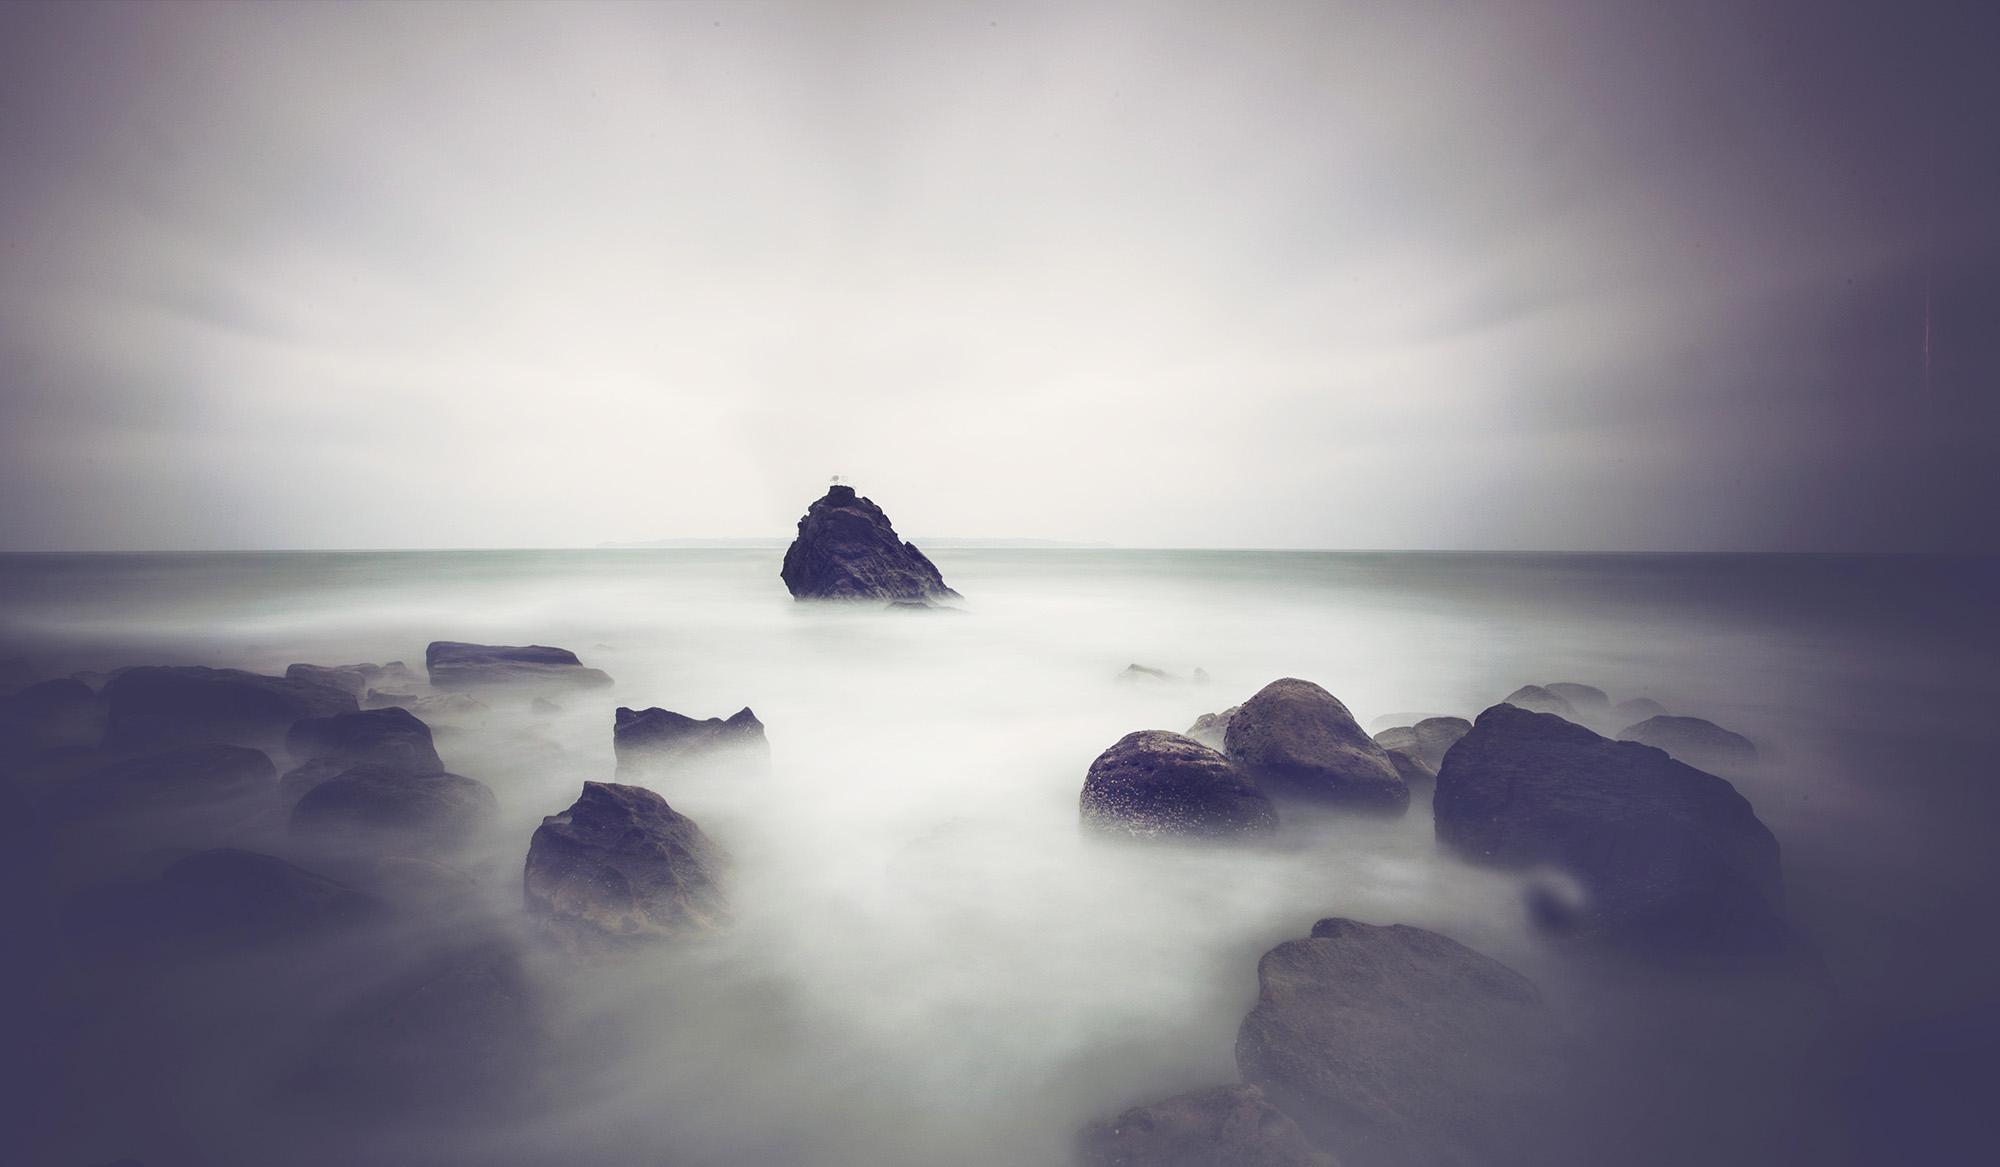 tides_03.jpg